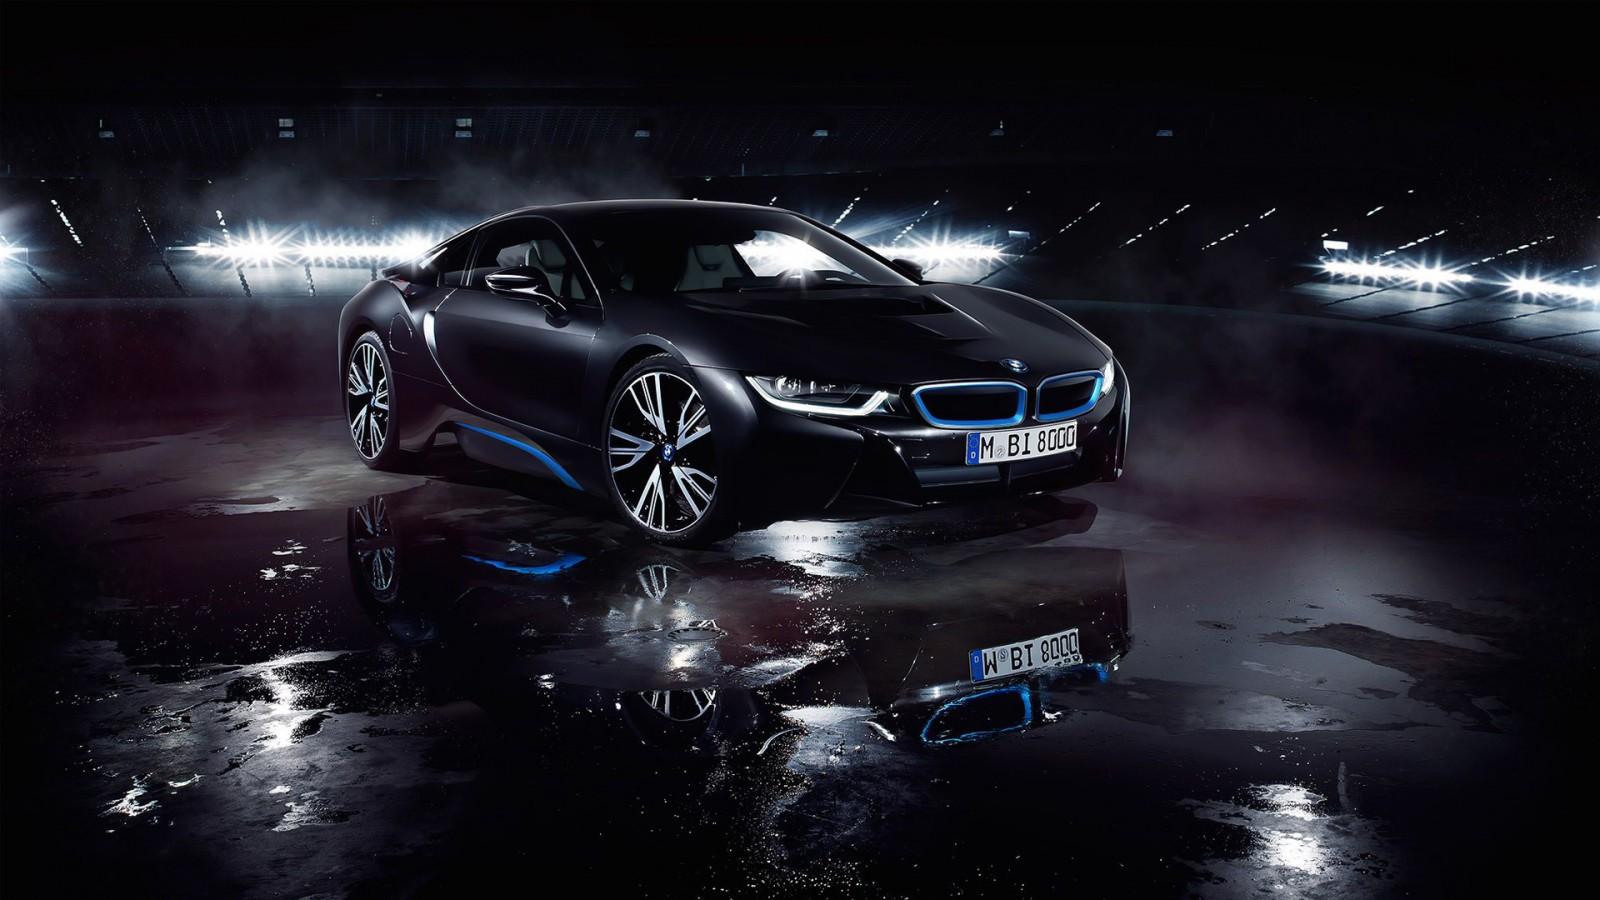 BMW i8 Matte Black Wallpaper | HD Car Wallpapers | ID #5789